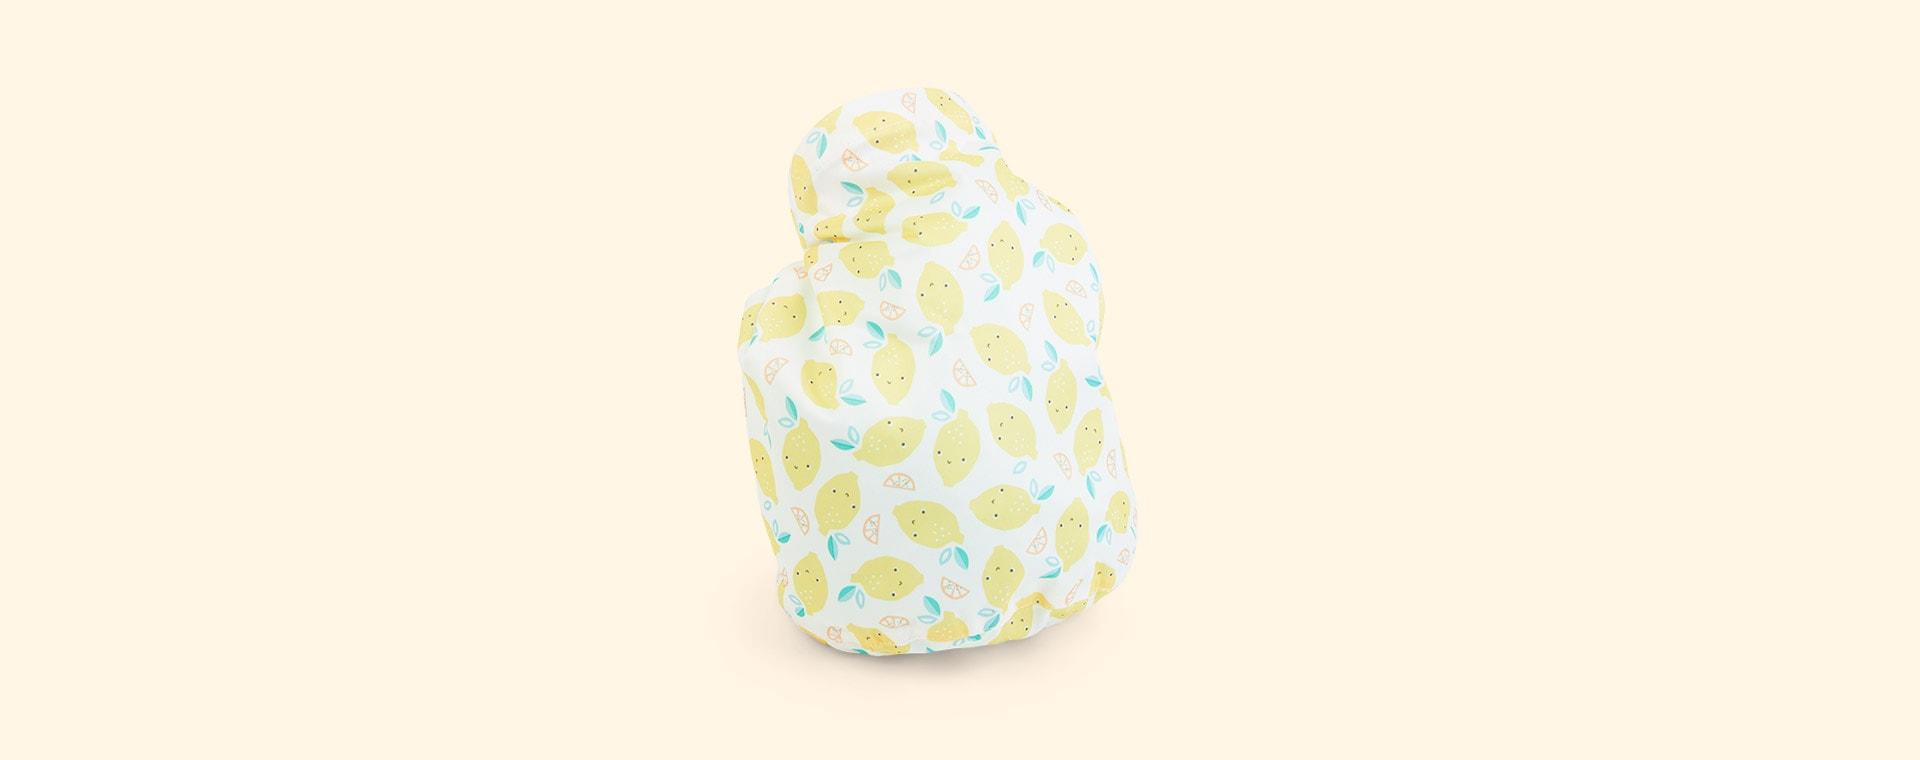 Lemon Print Bambino Mio Wet Bag